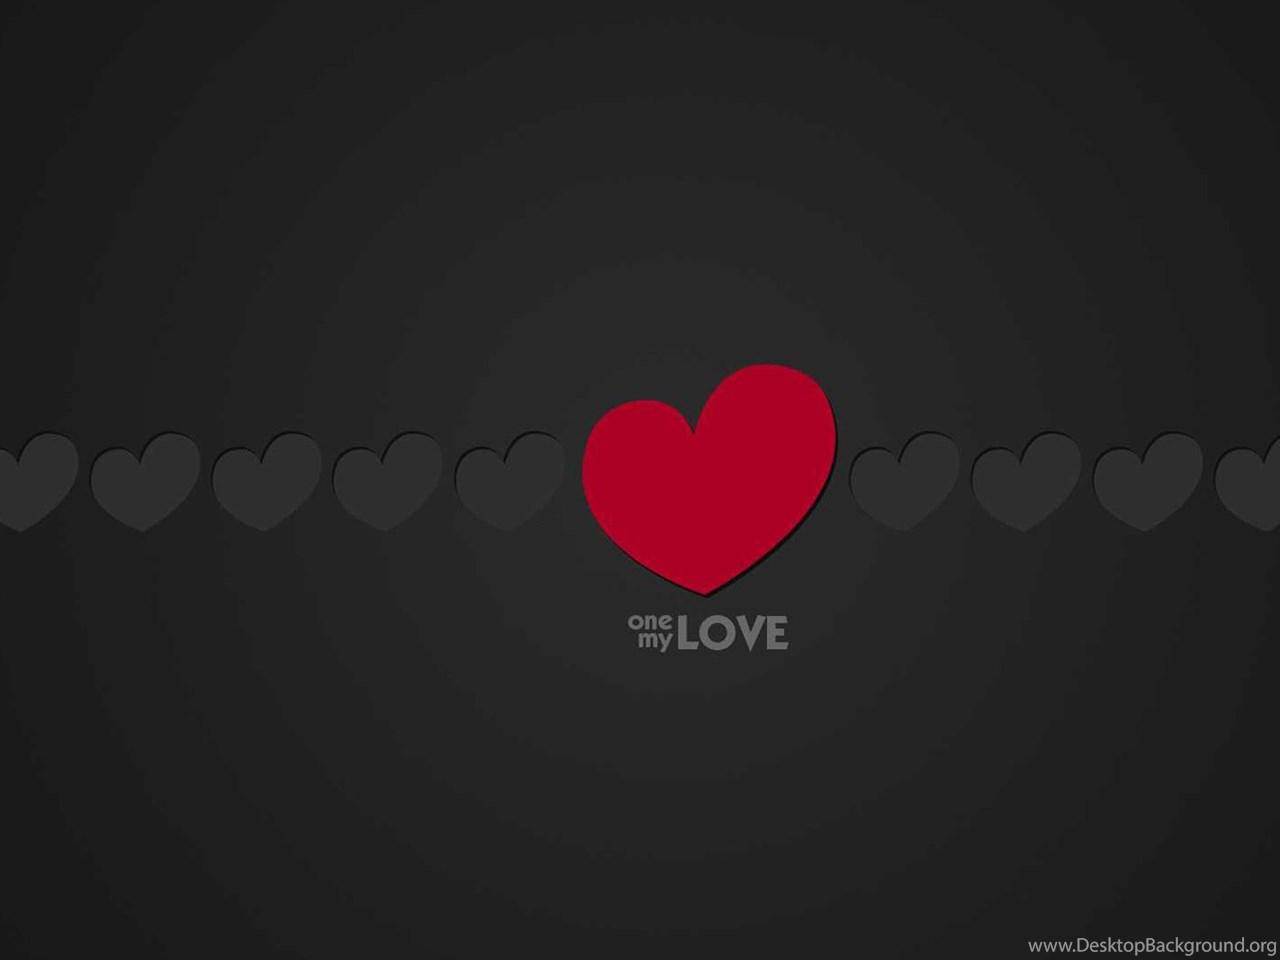 Black And Red Heart Wallpapers 02 Hd Desktop Wallpapers Desktop Background